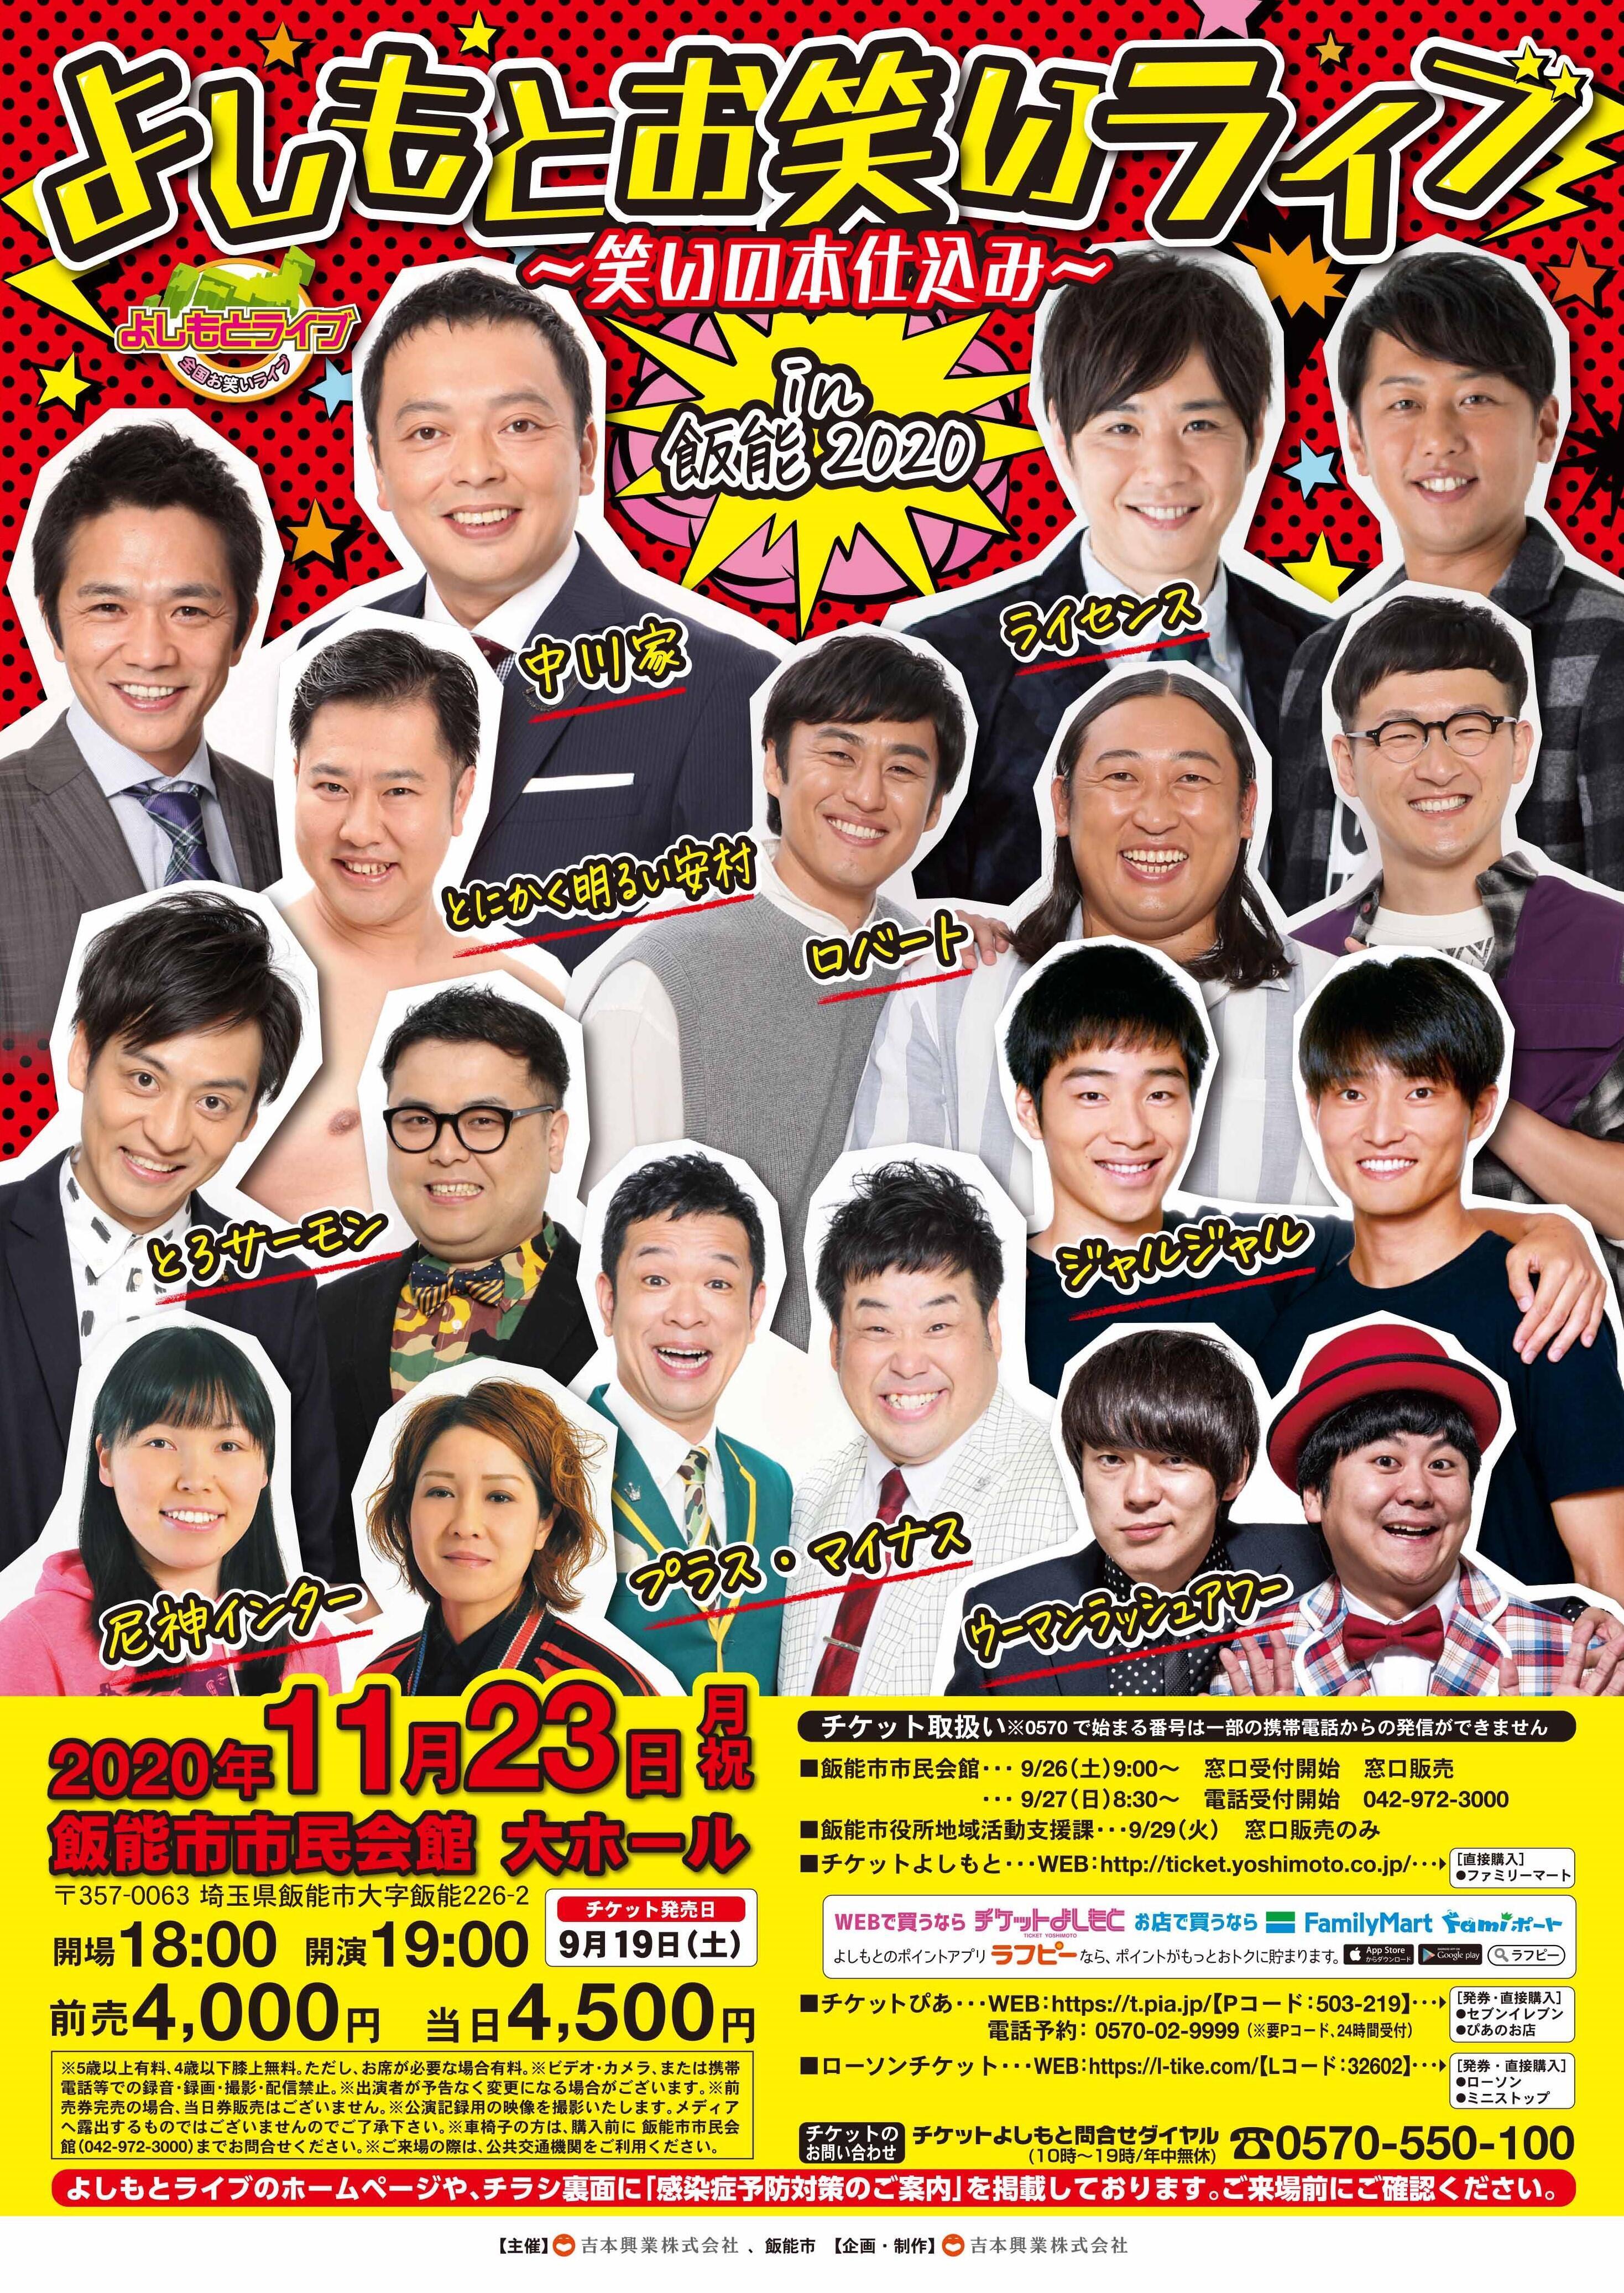 http://www.syumatsu.jp/20200919182318-01aa6c2207804faa169ff13161289f81c4bebb20.jpg